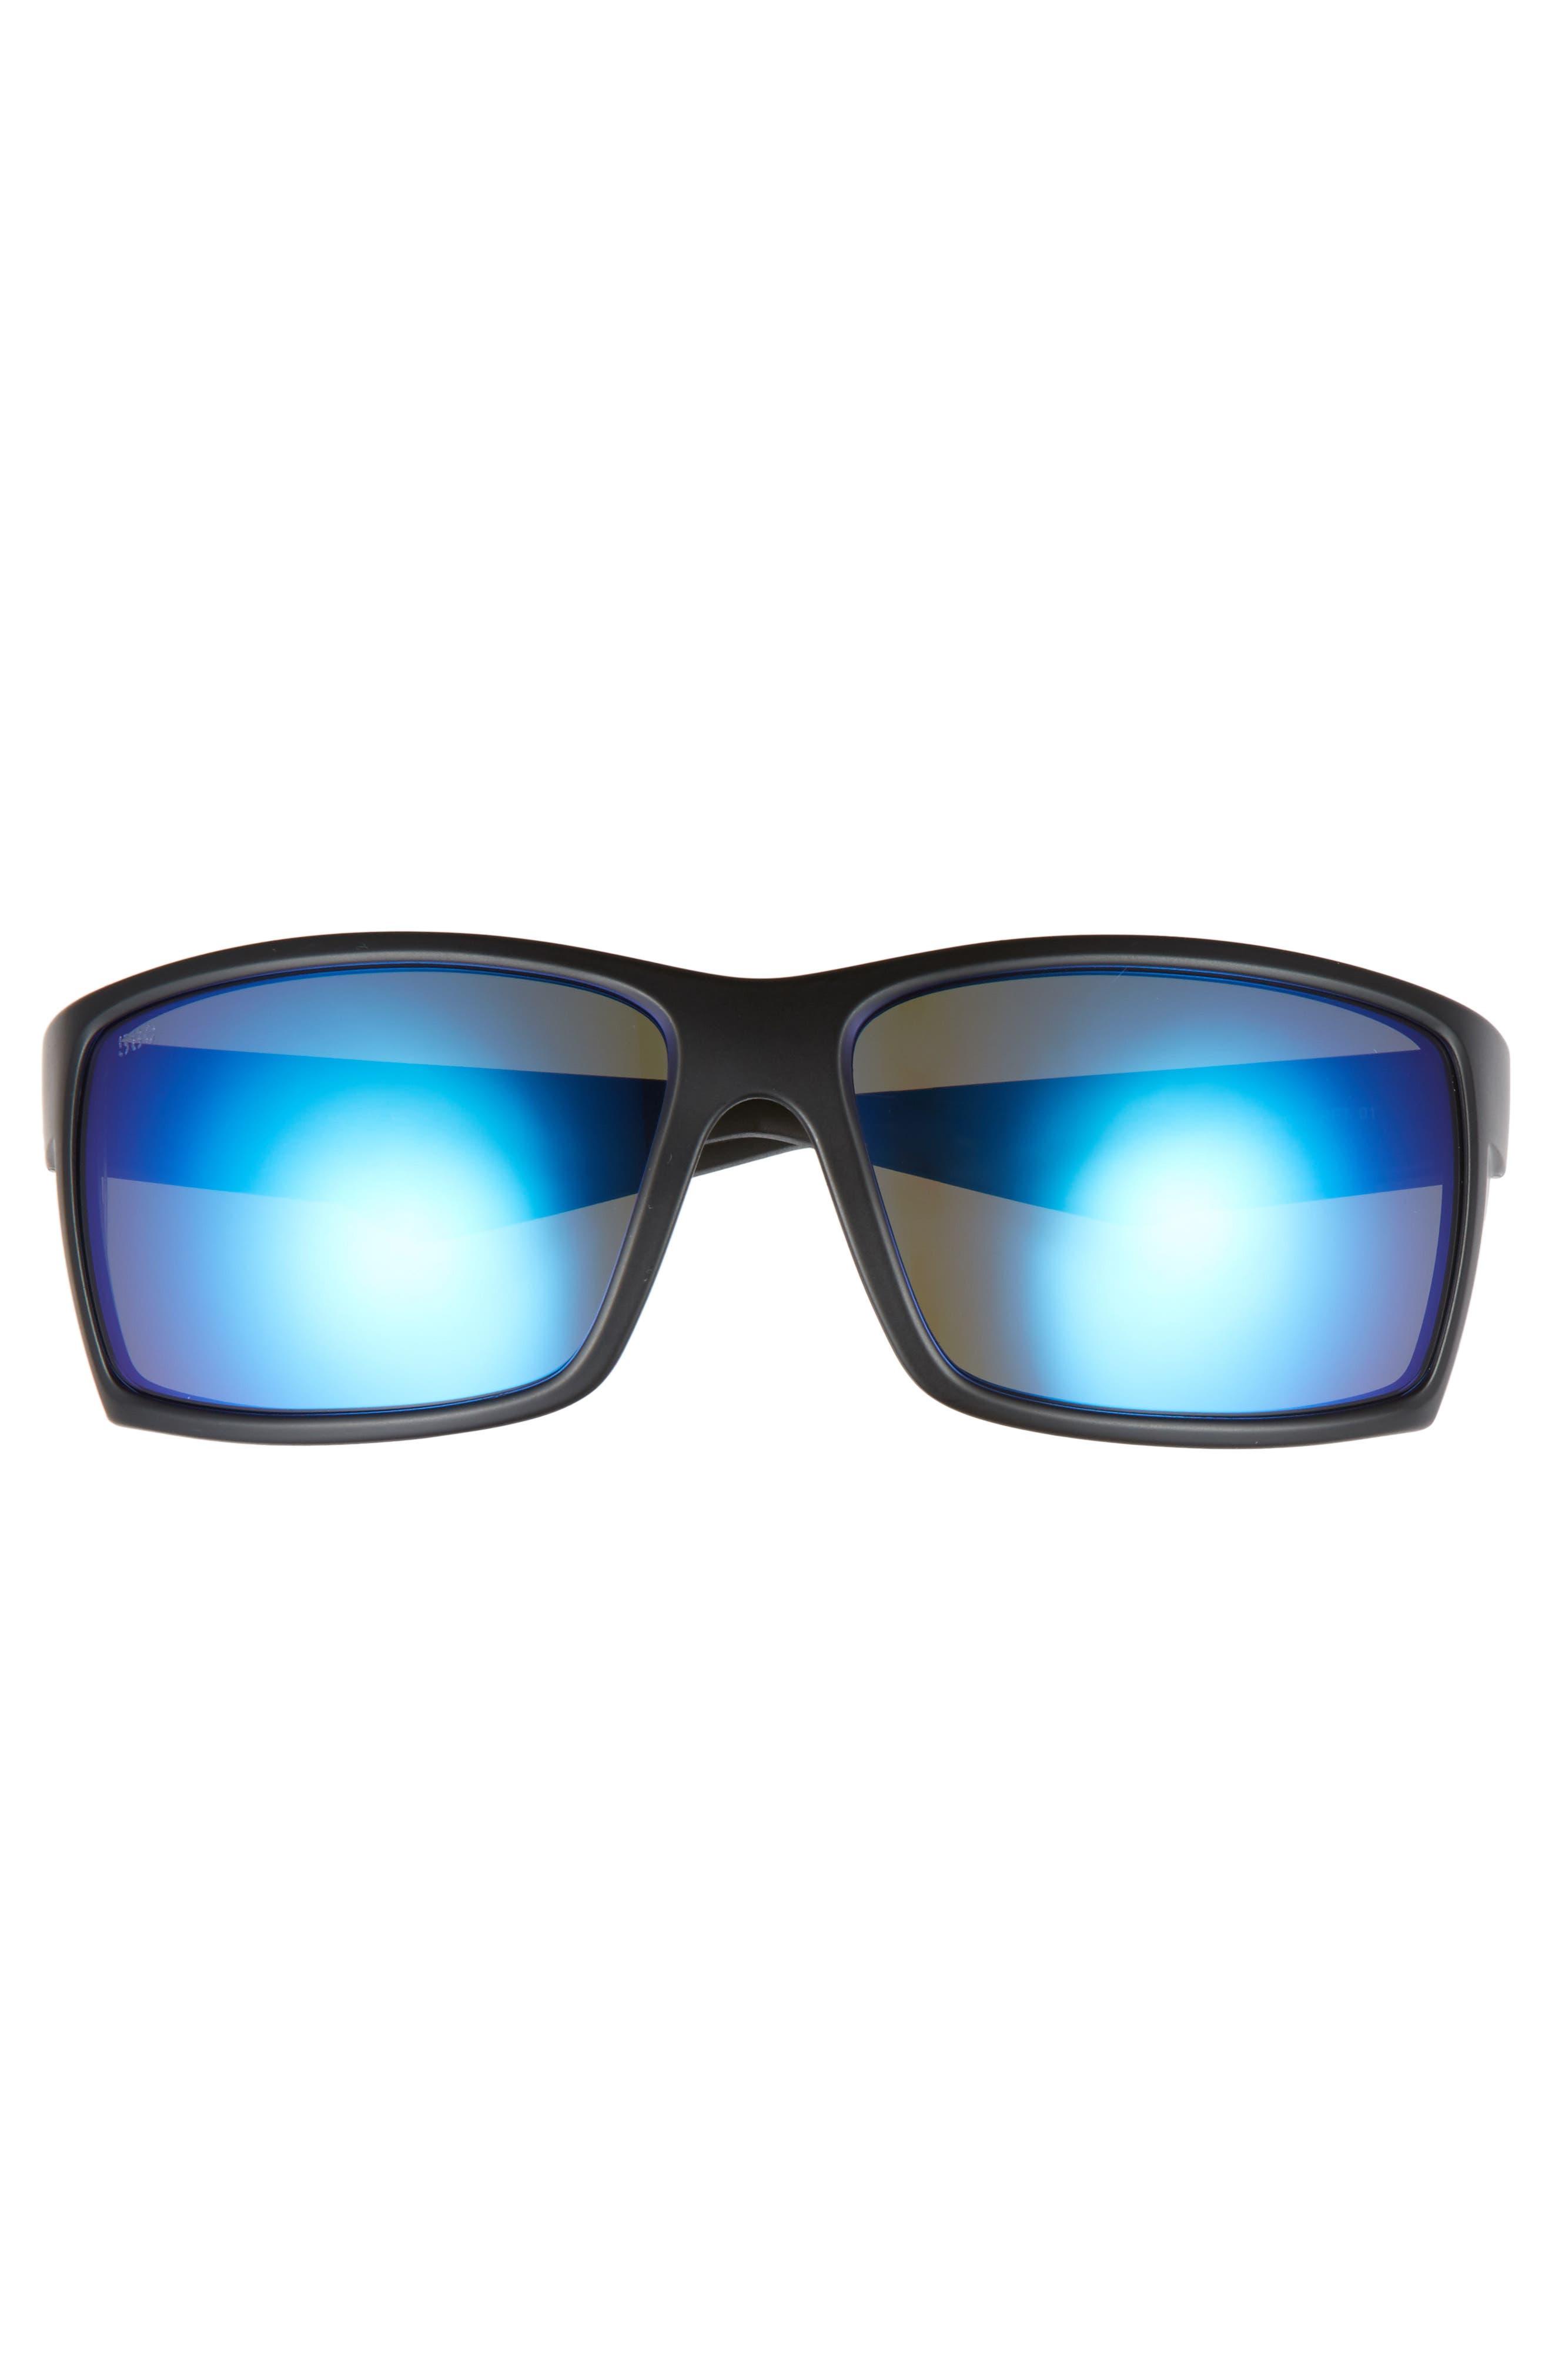 Reefton 65mm Polarized Sunglasses,                             Alternate thumbnail 2, color,                             Blackout/ Blue Mirror